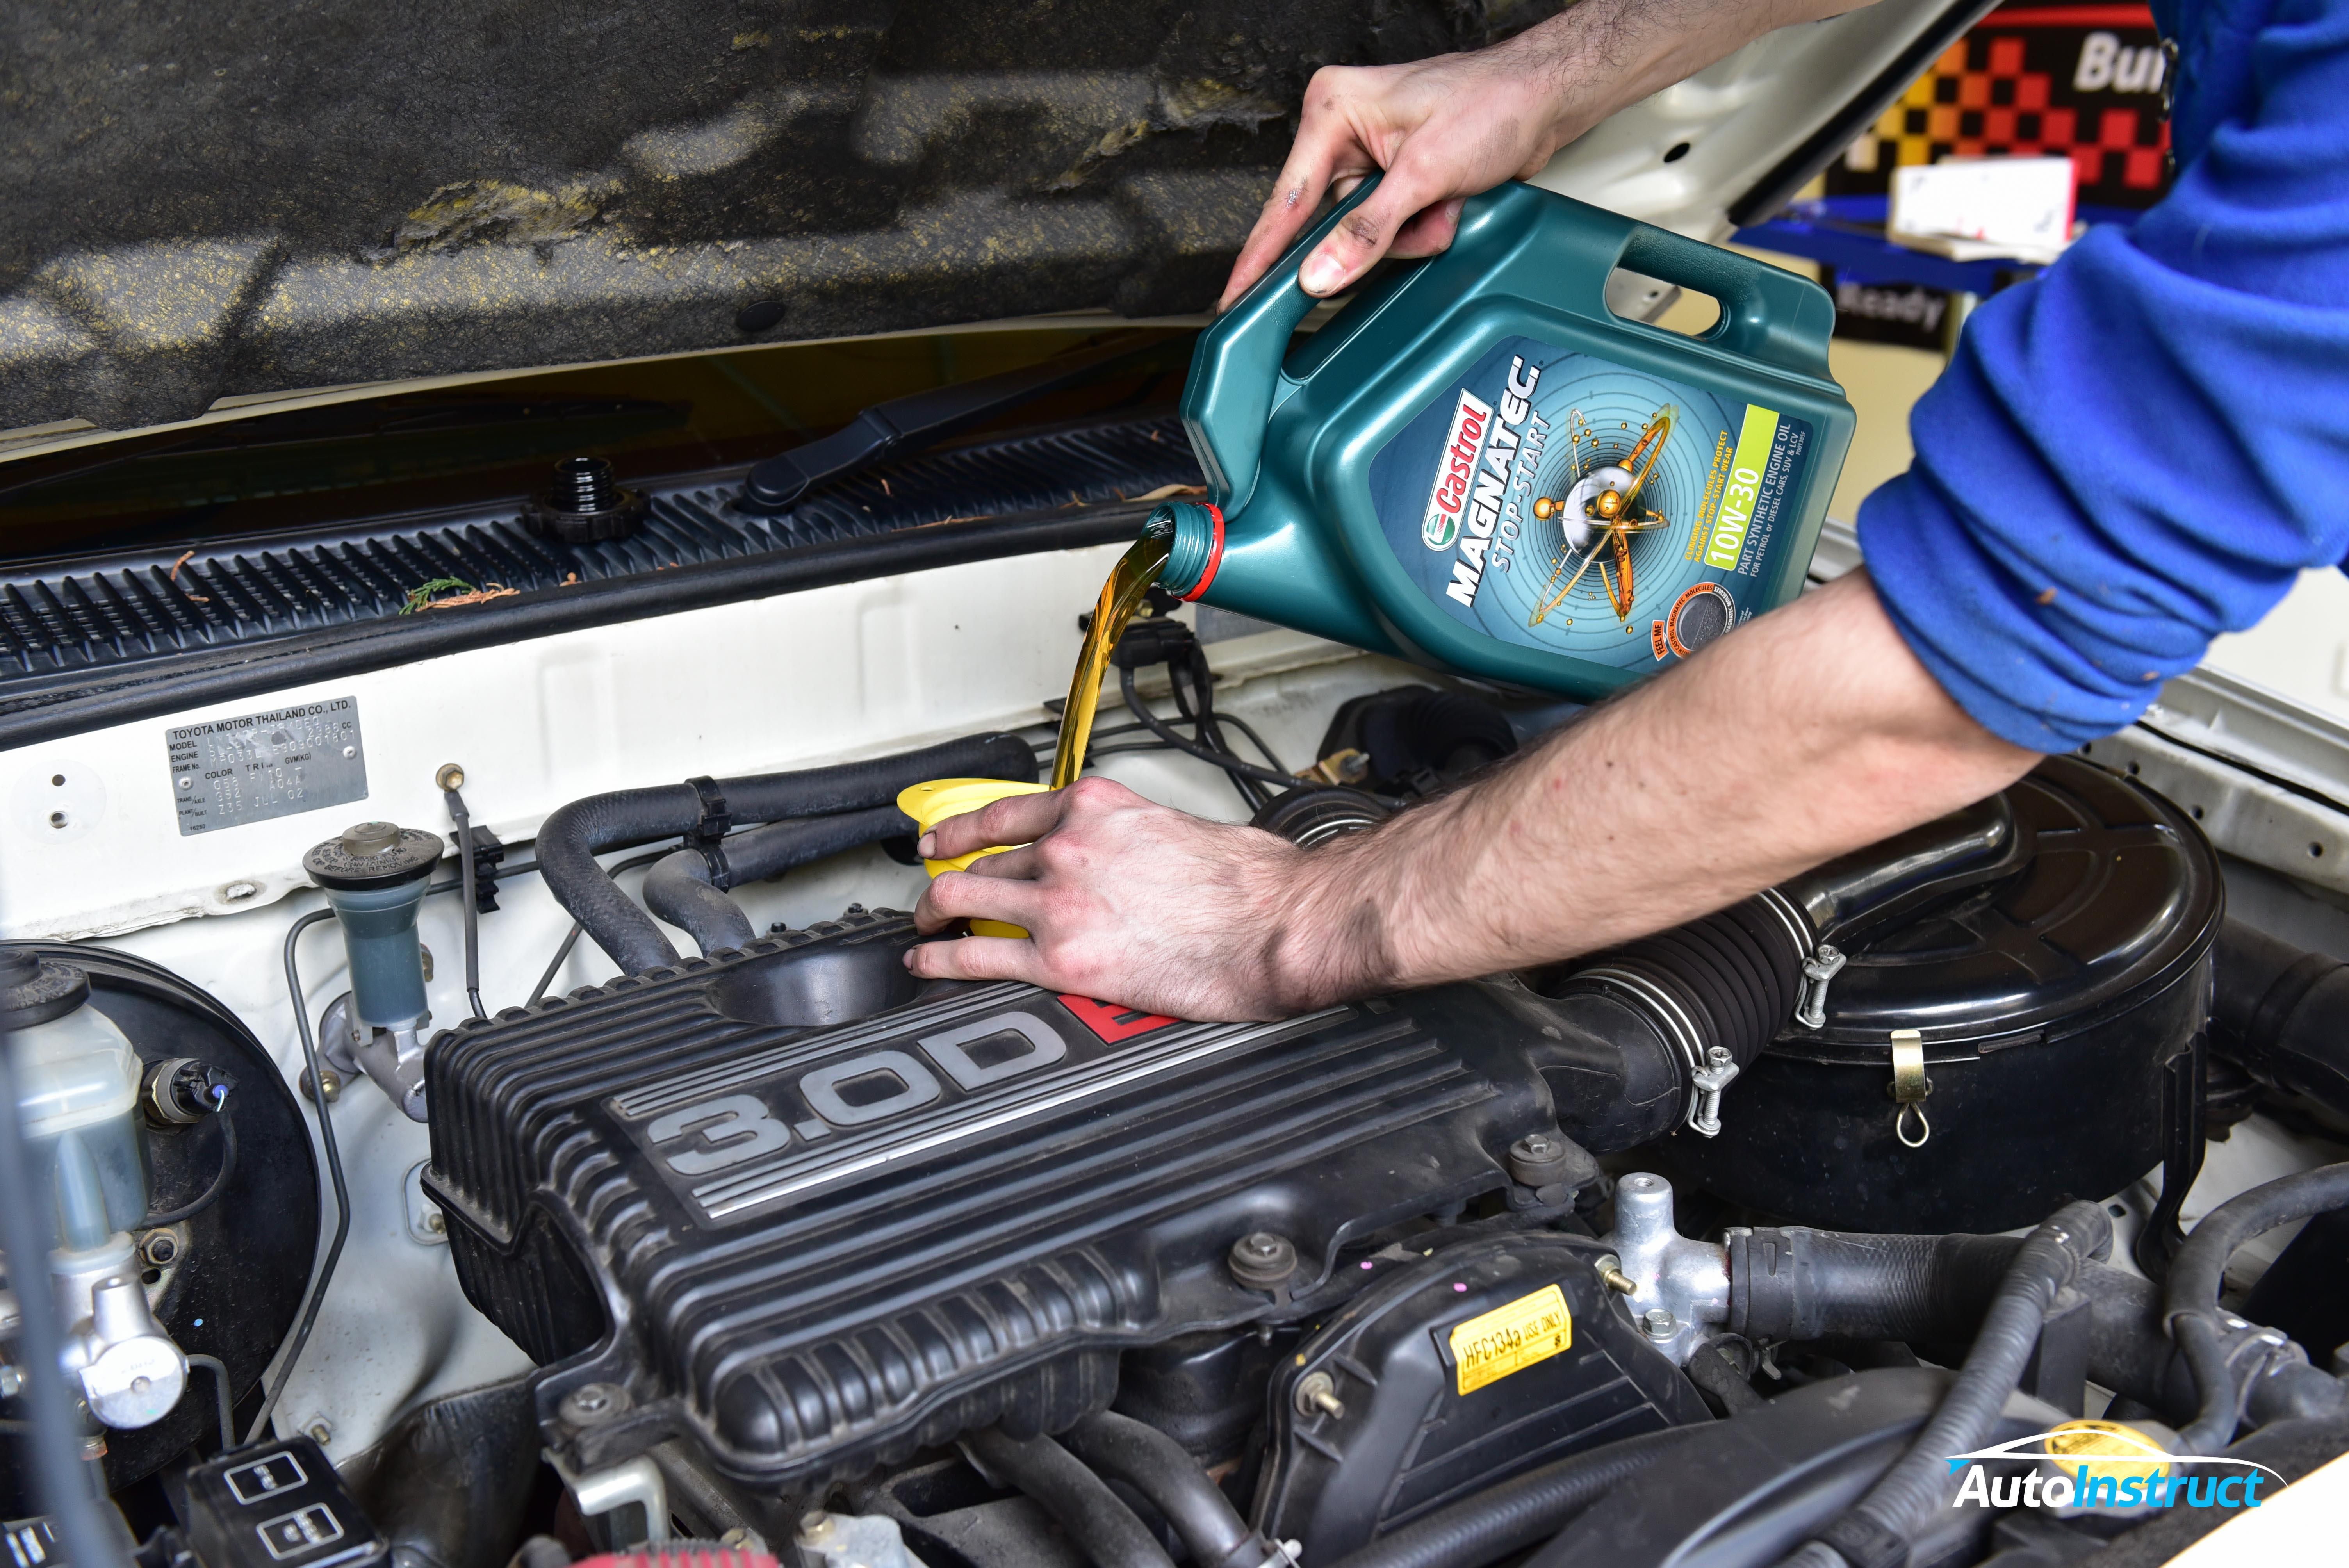 Toyota Hilux Engine Oil Change (6th Gen)